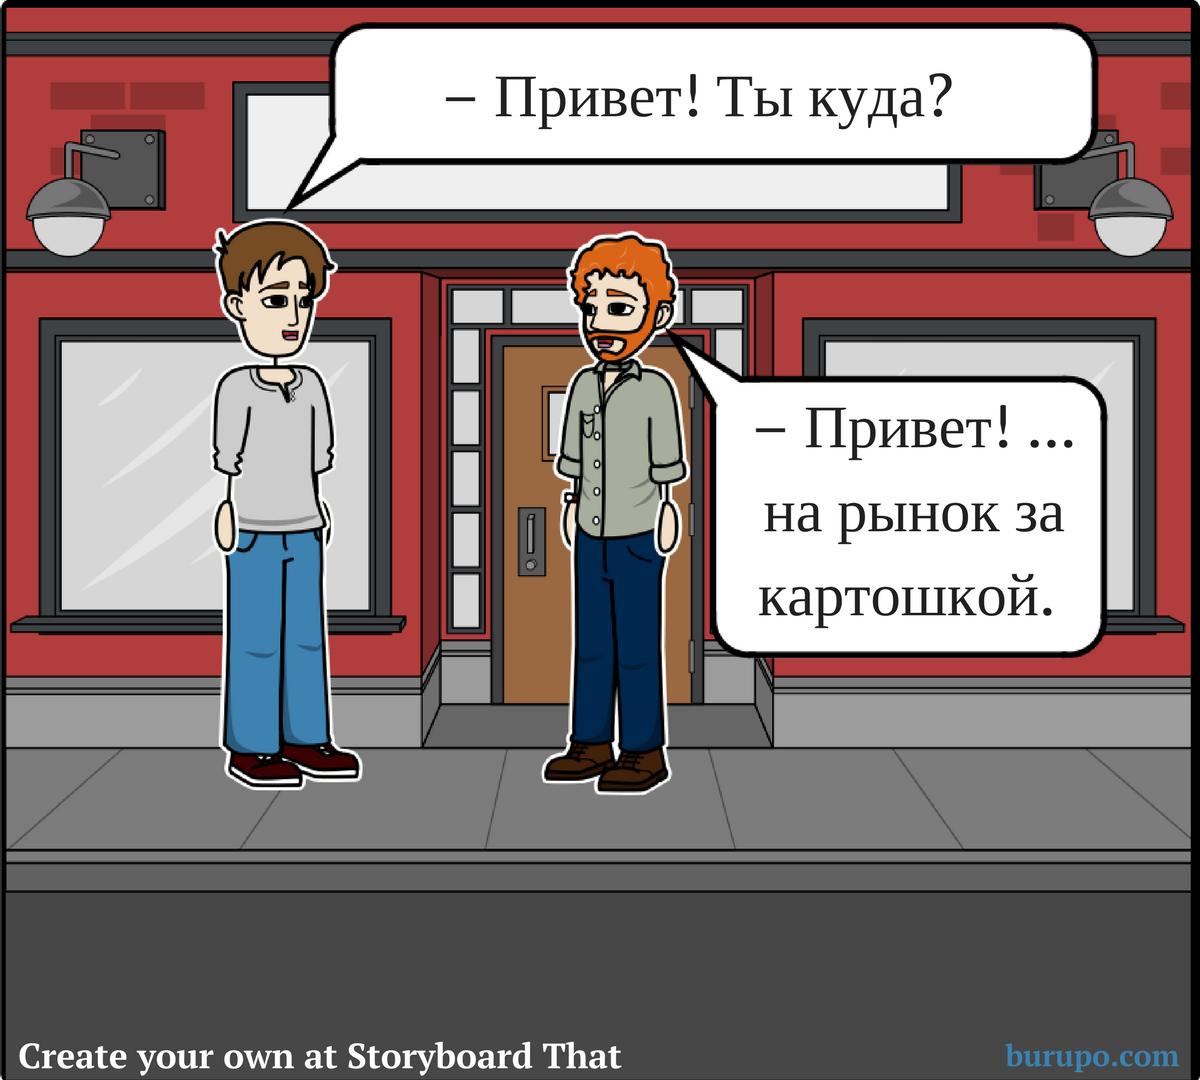 глаголы движения / russian verbs of motion example 1